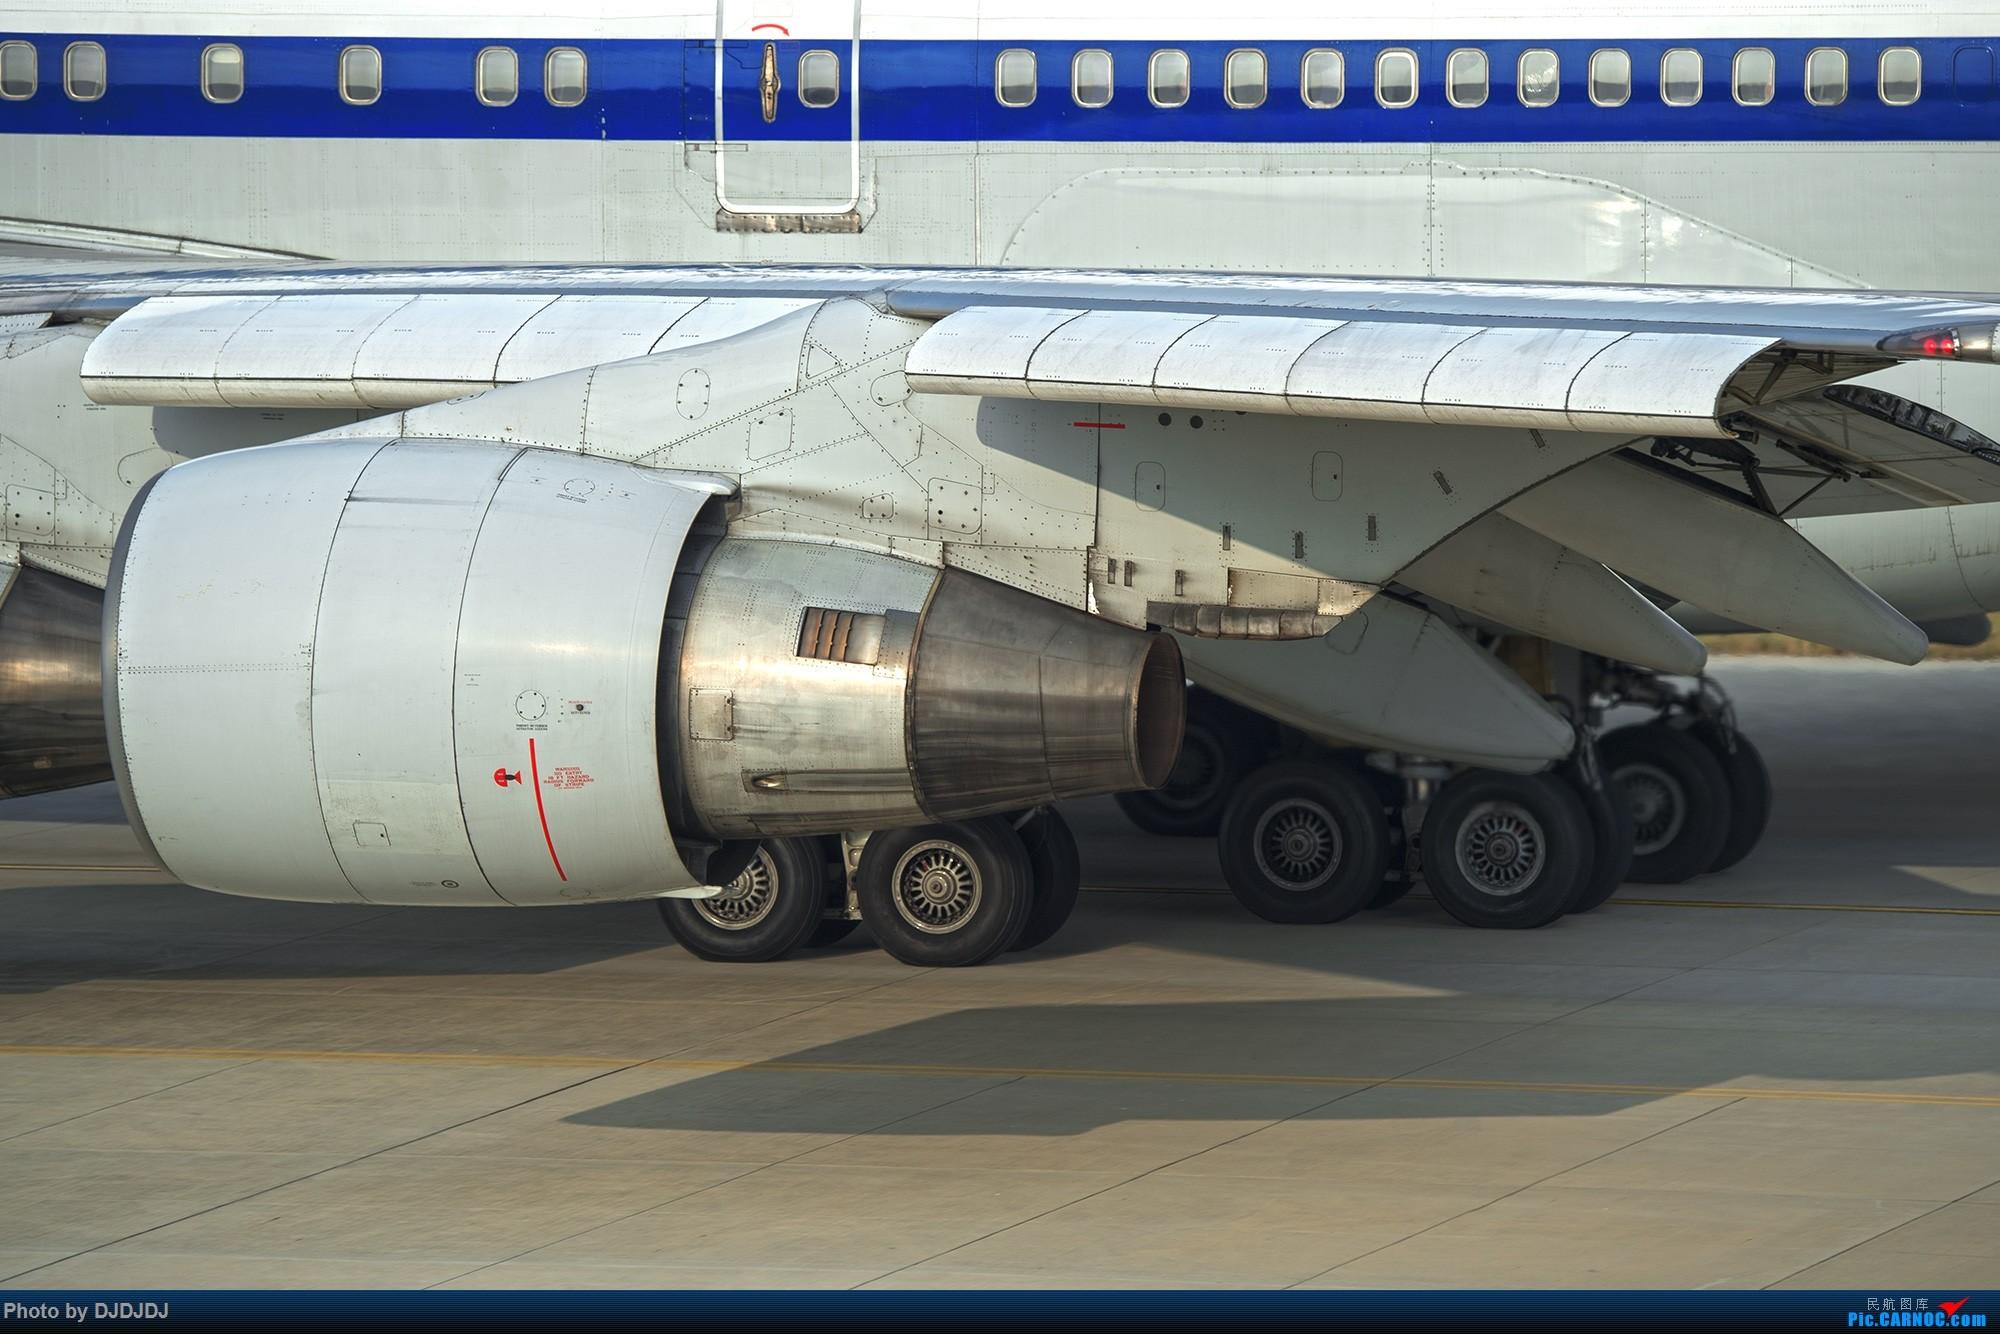 Re:[原创]【BLDDQ--深圳打机队】新春第一帖试下新机器--大额头 BOEING 747-400 B-2445 中国深圳宝安国际机场